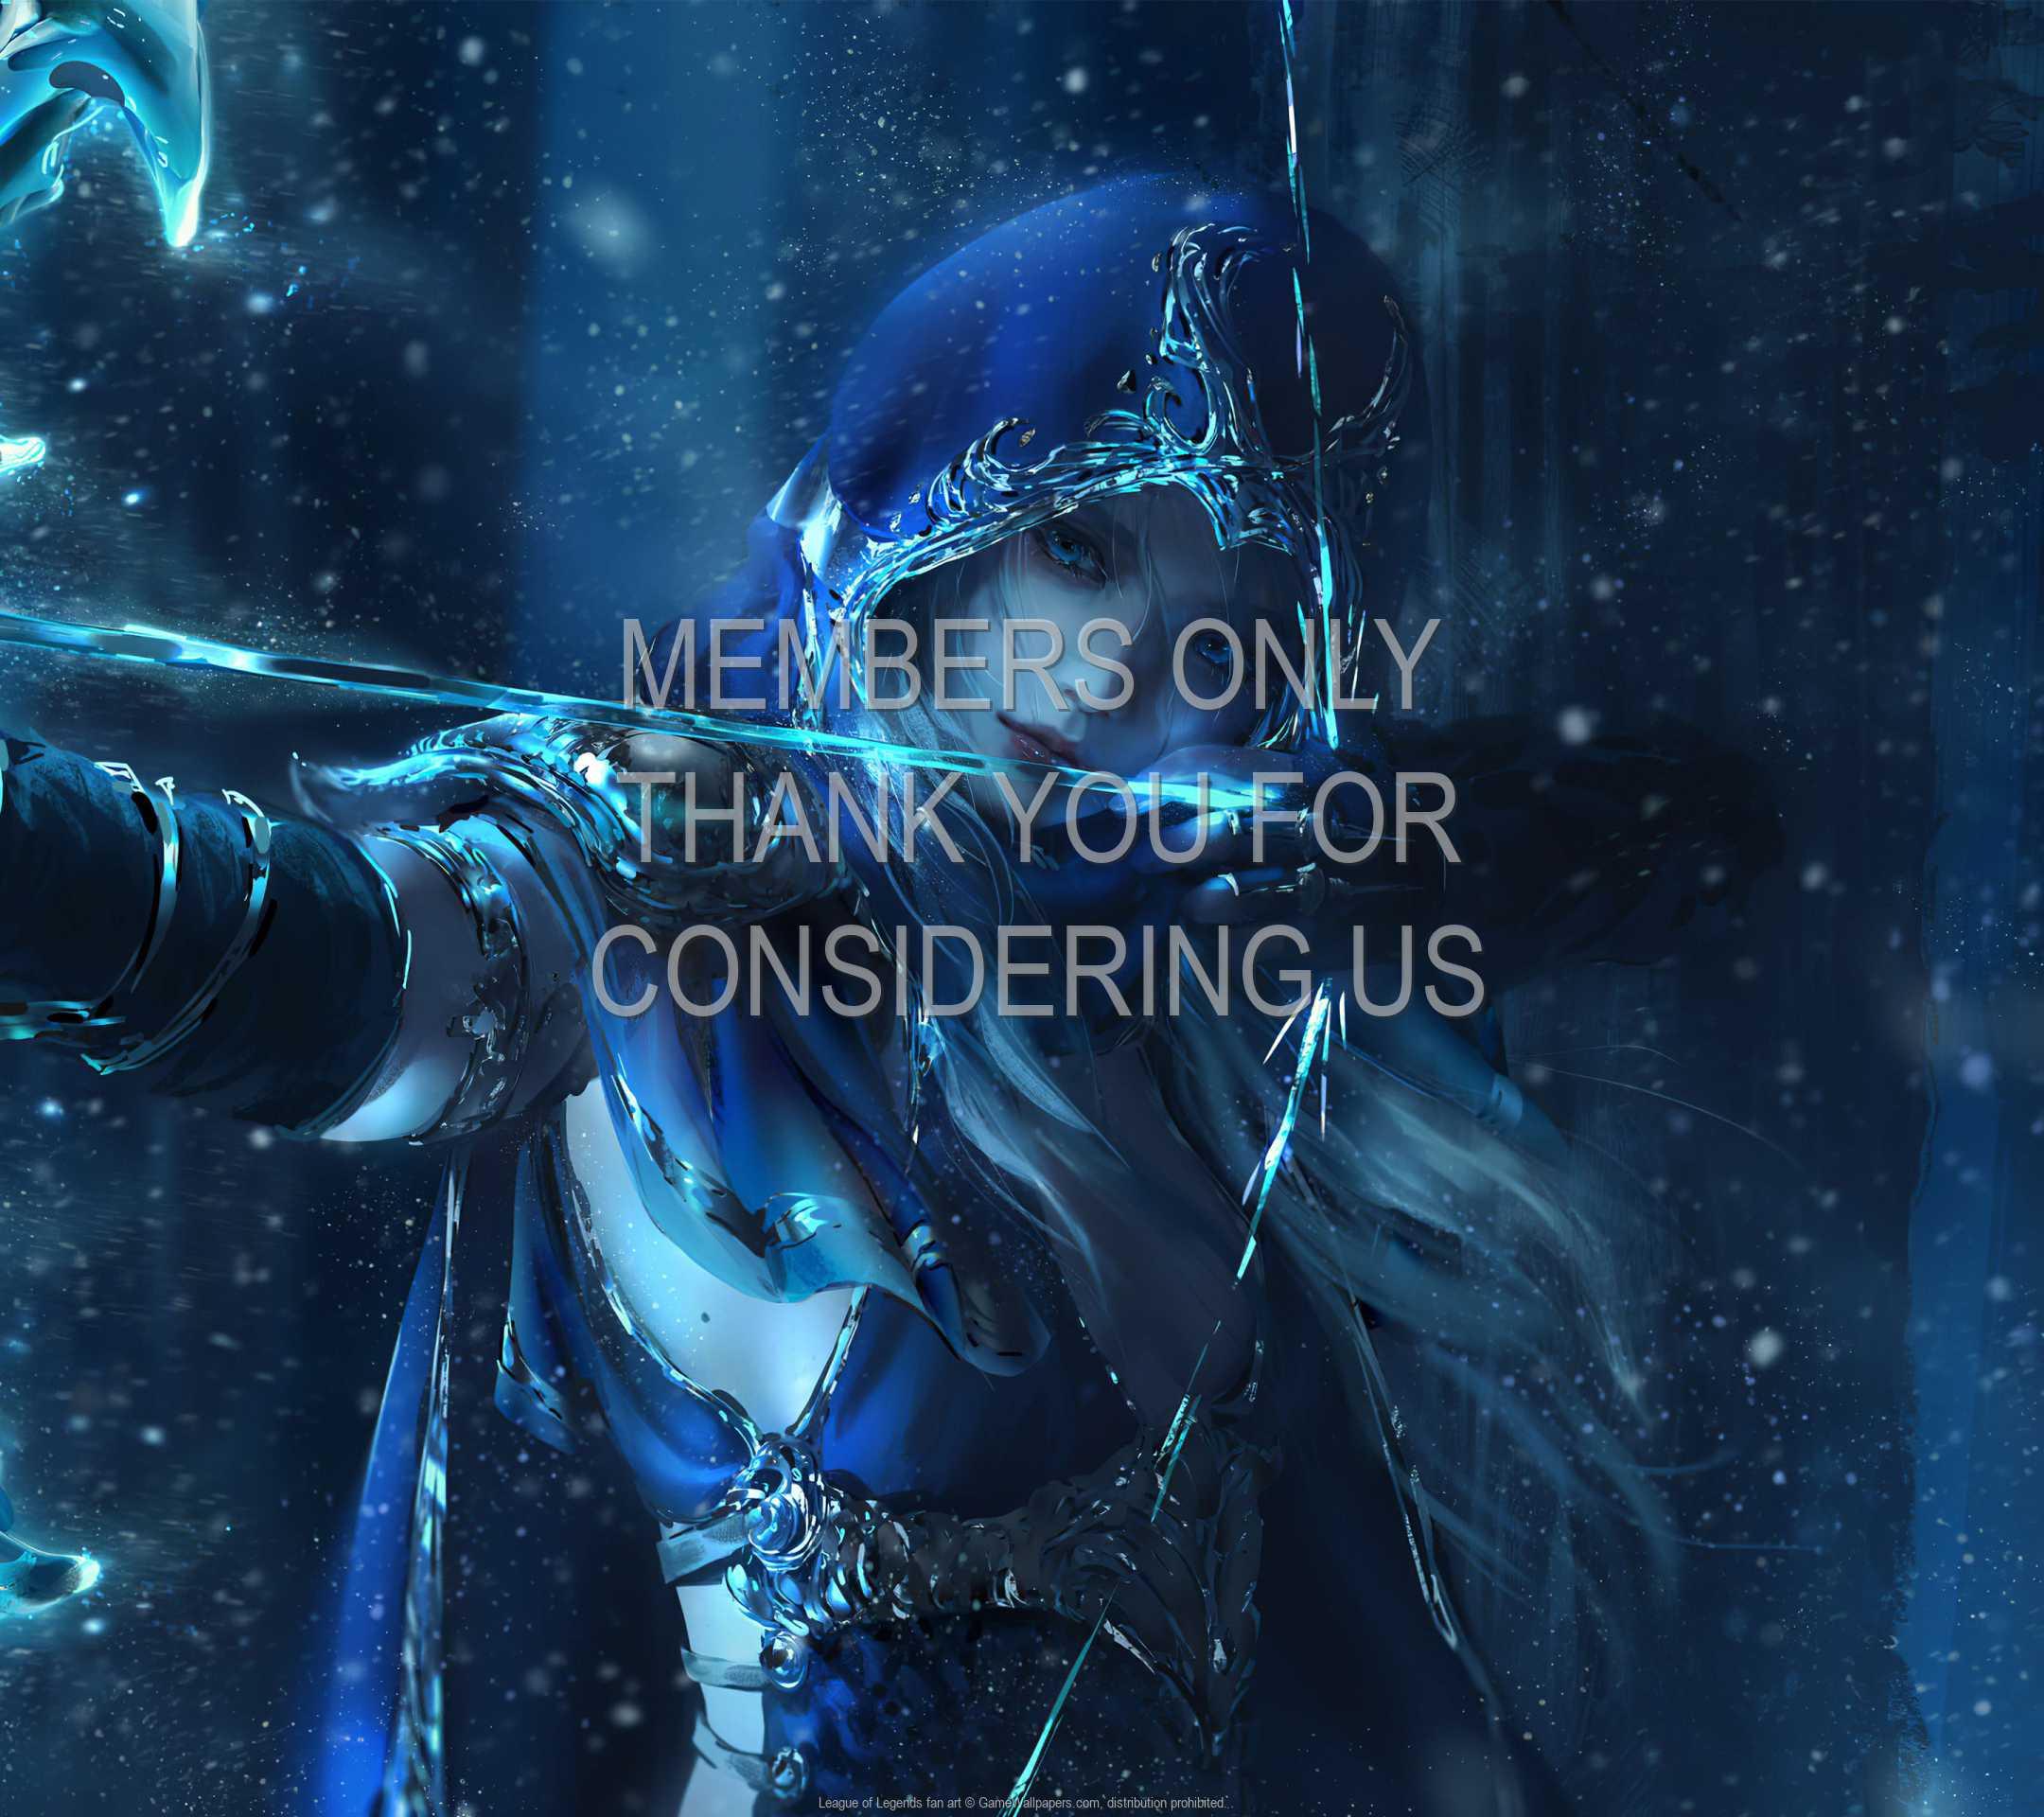 League of Legends fan art 1080p Horizontal Handy Hintergrundbild 15